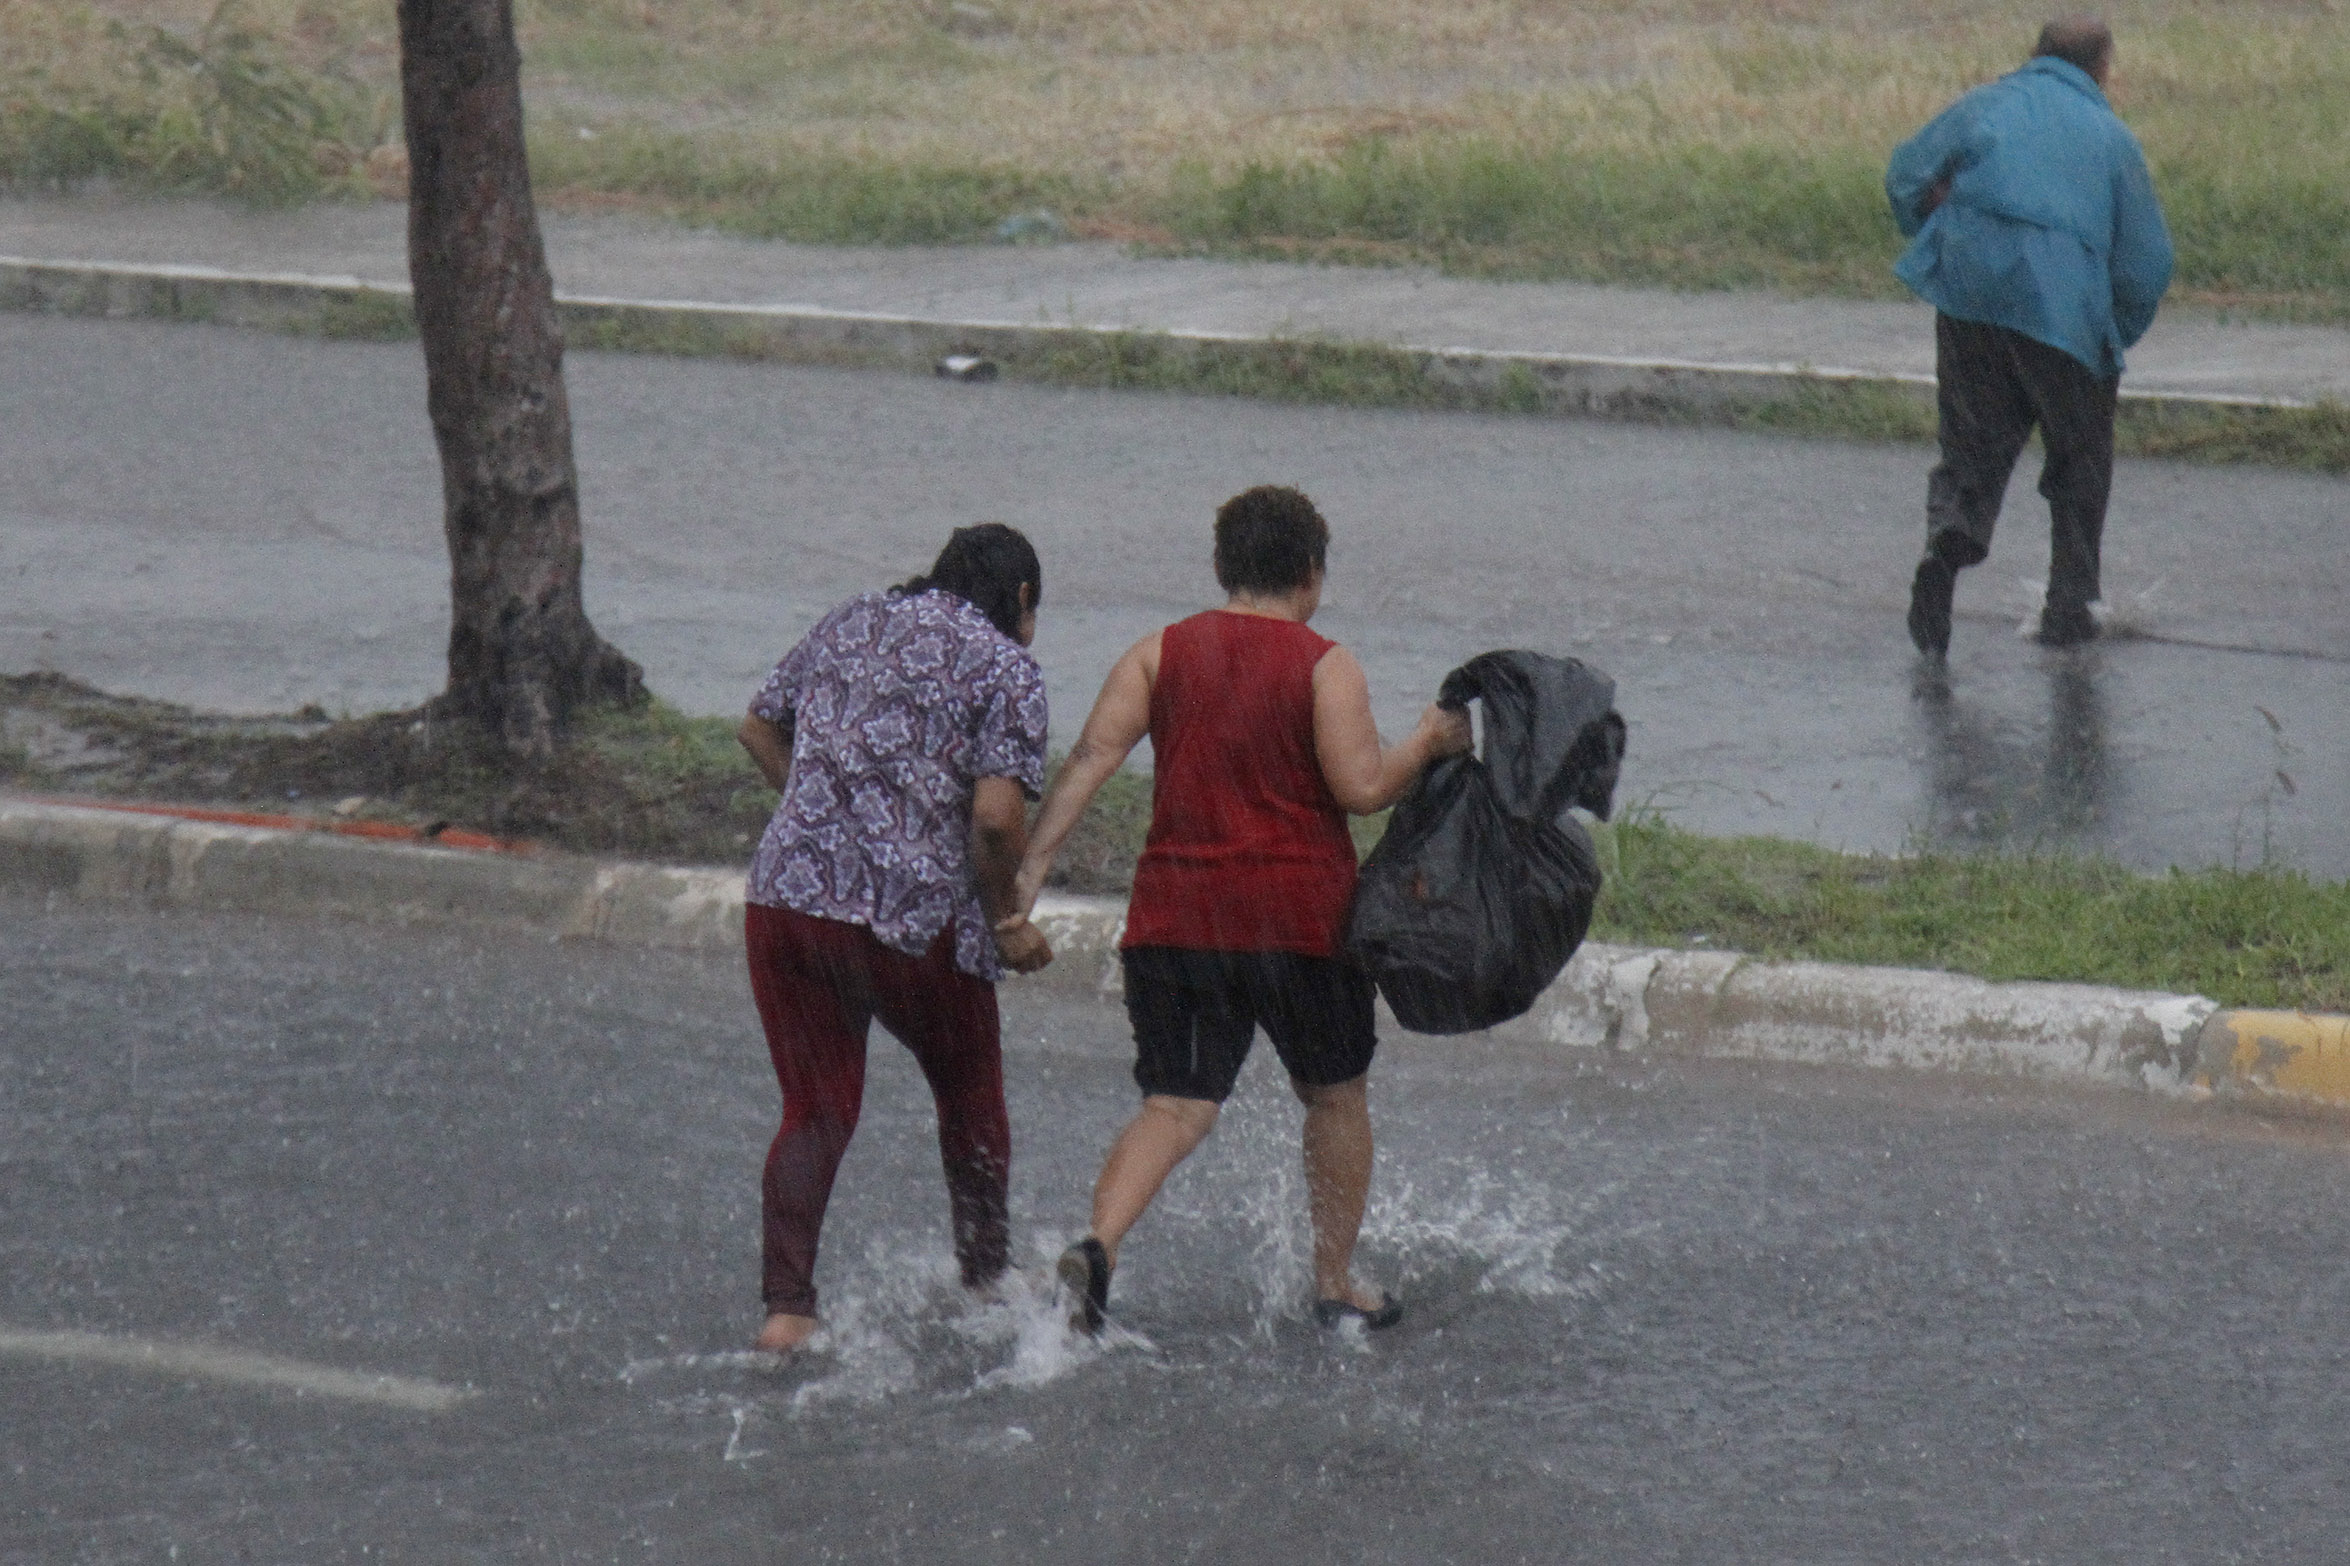 Tormenta tropical Carlotta provocará tormentas en 10 entidades del país